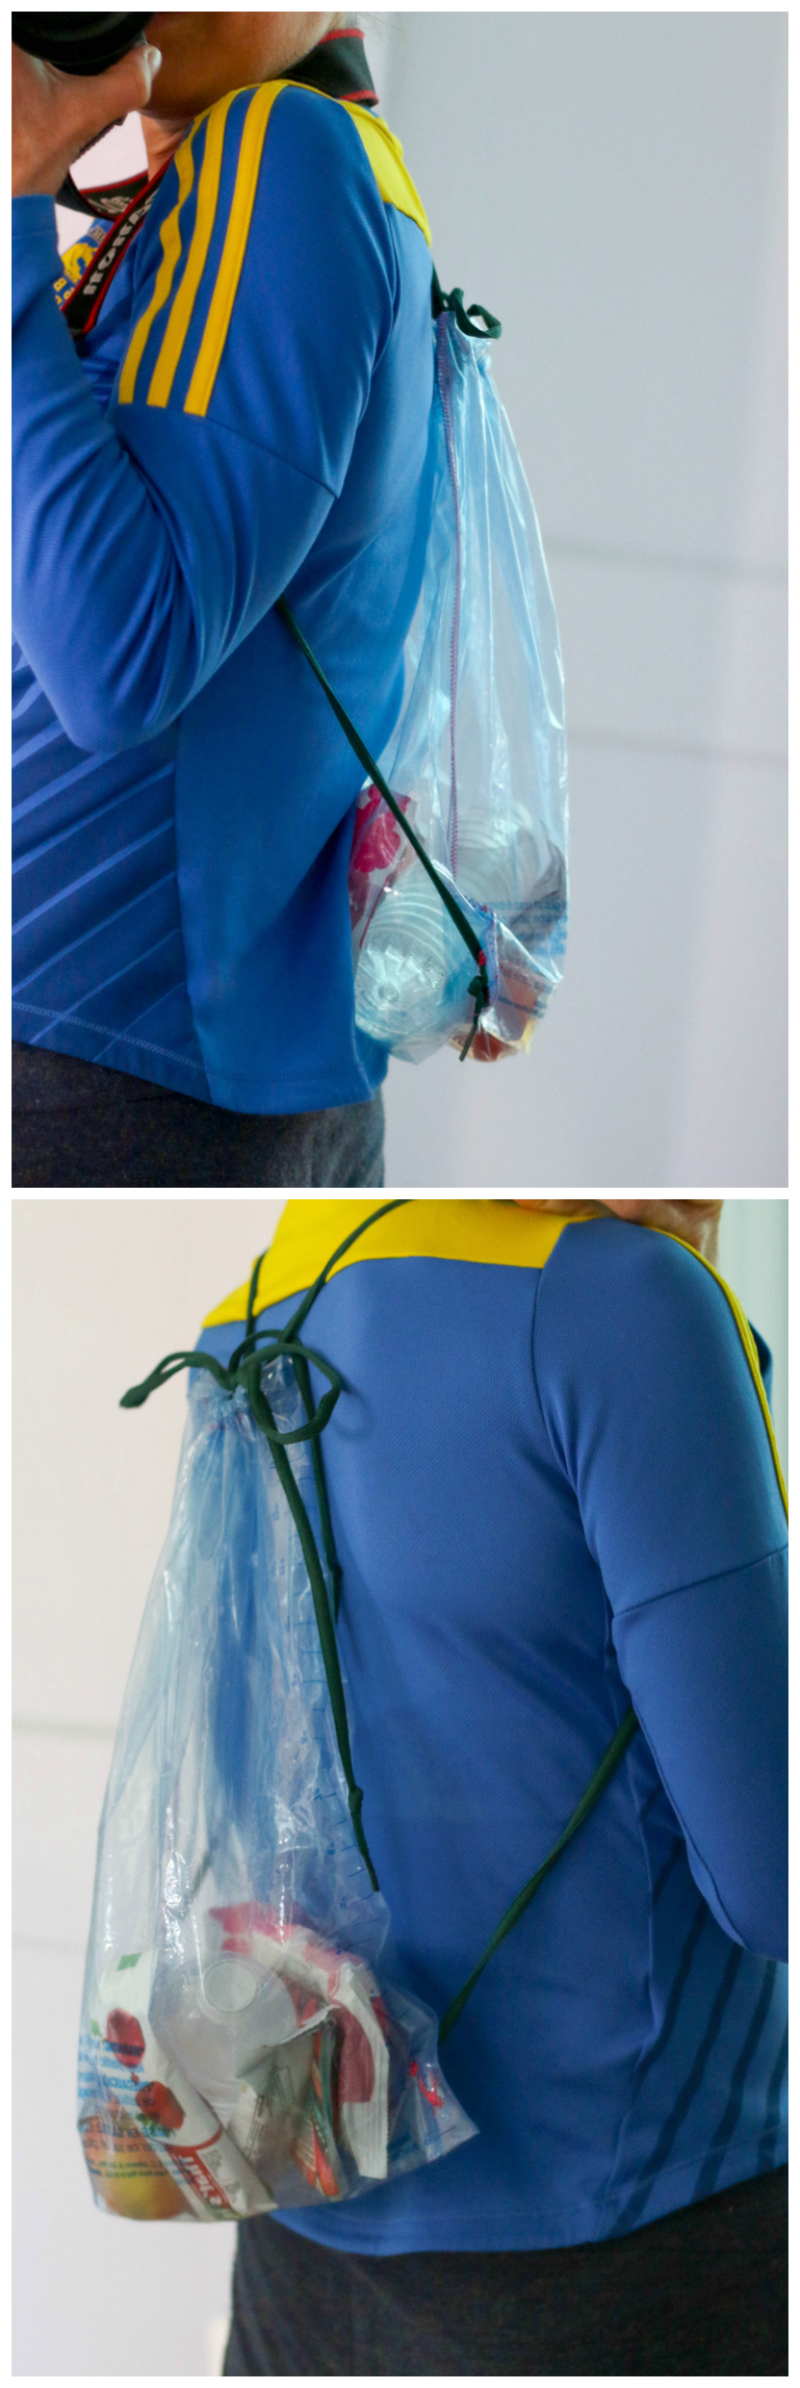 Bag collage2